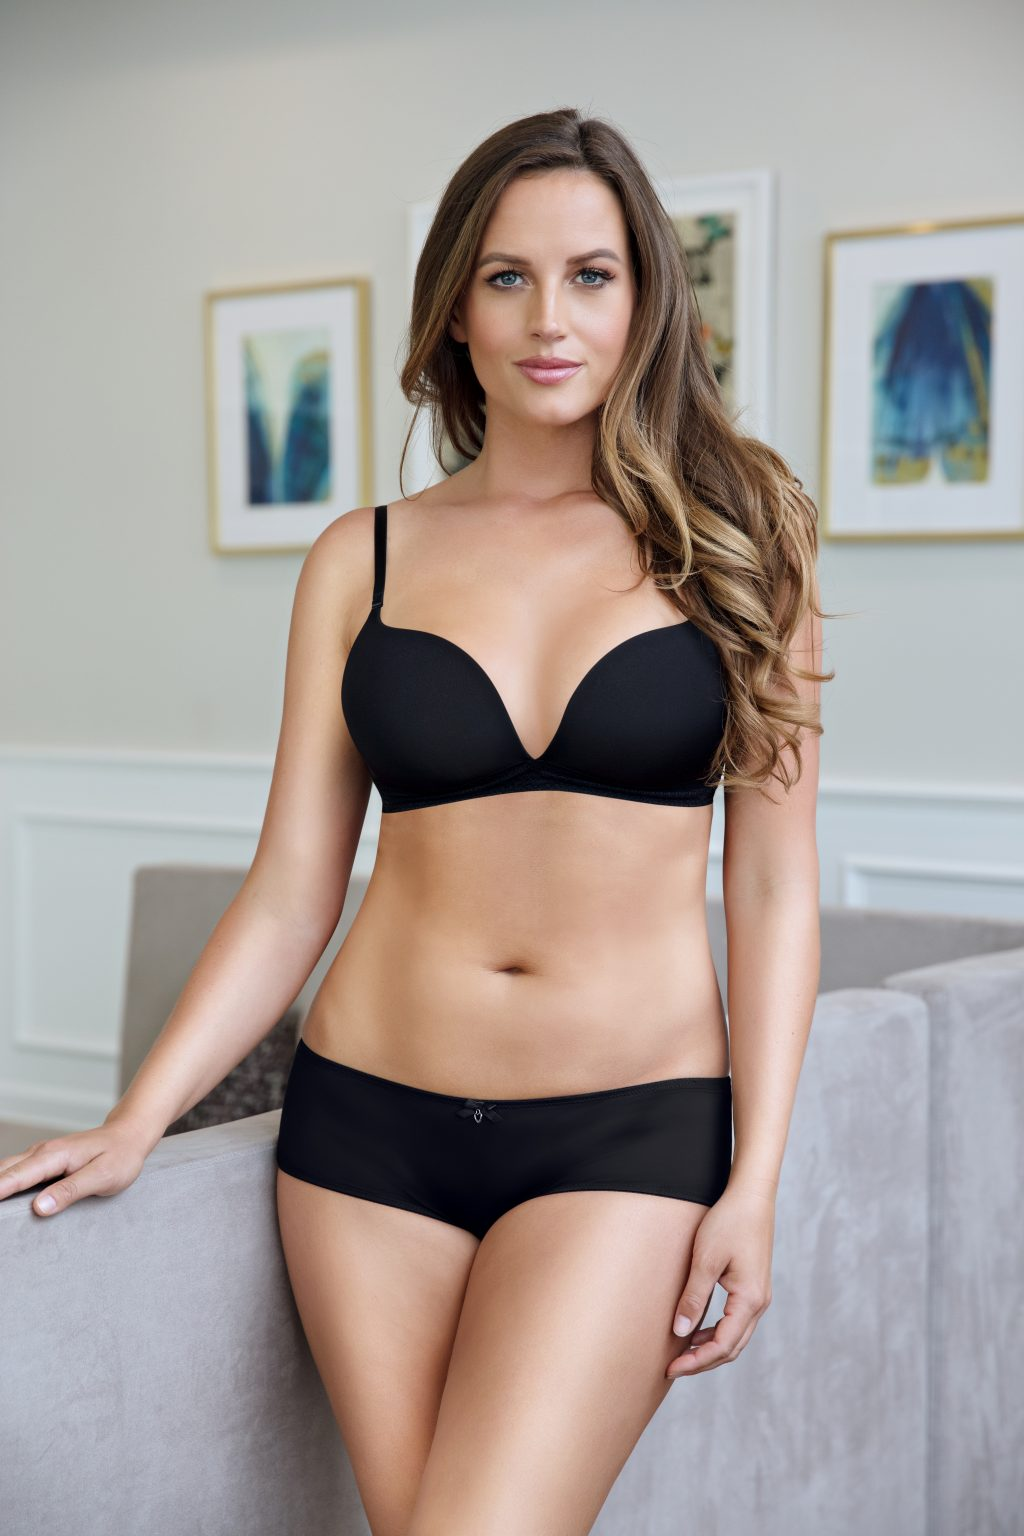 how should a wireless bra fit